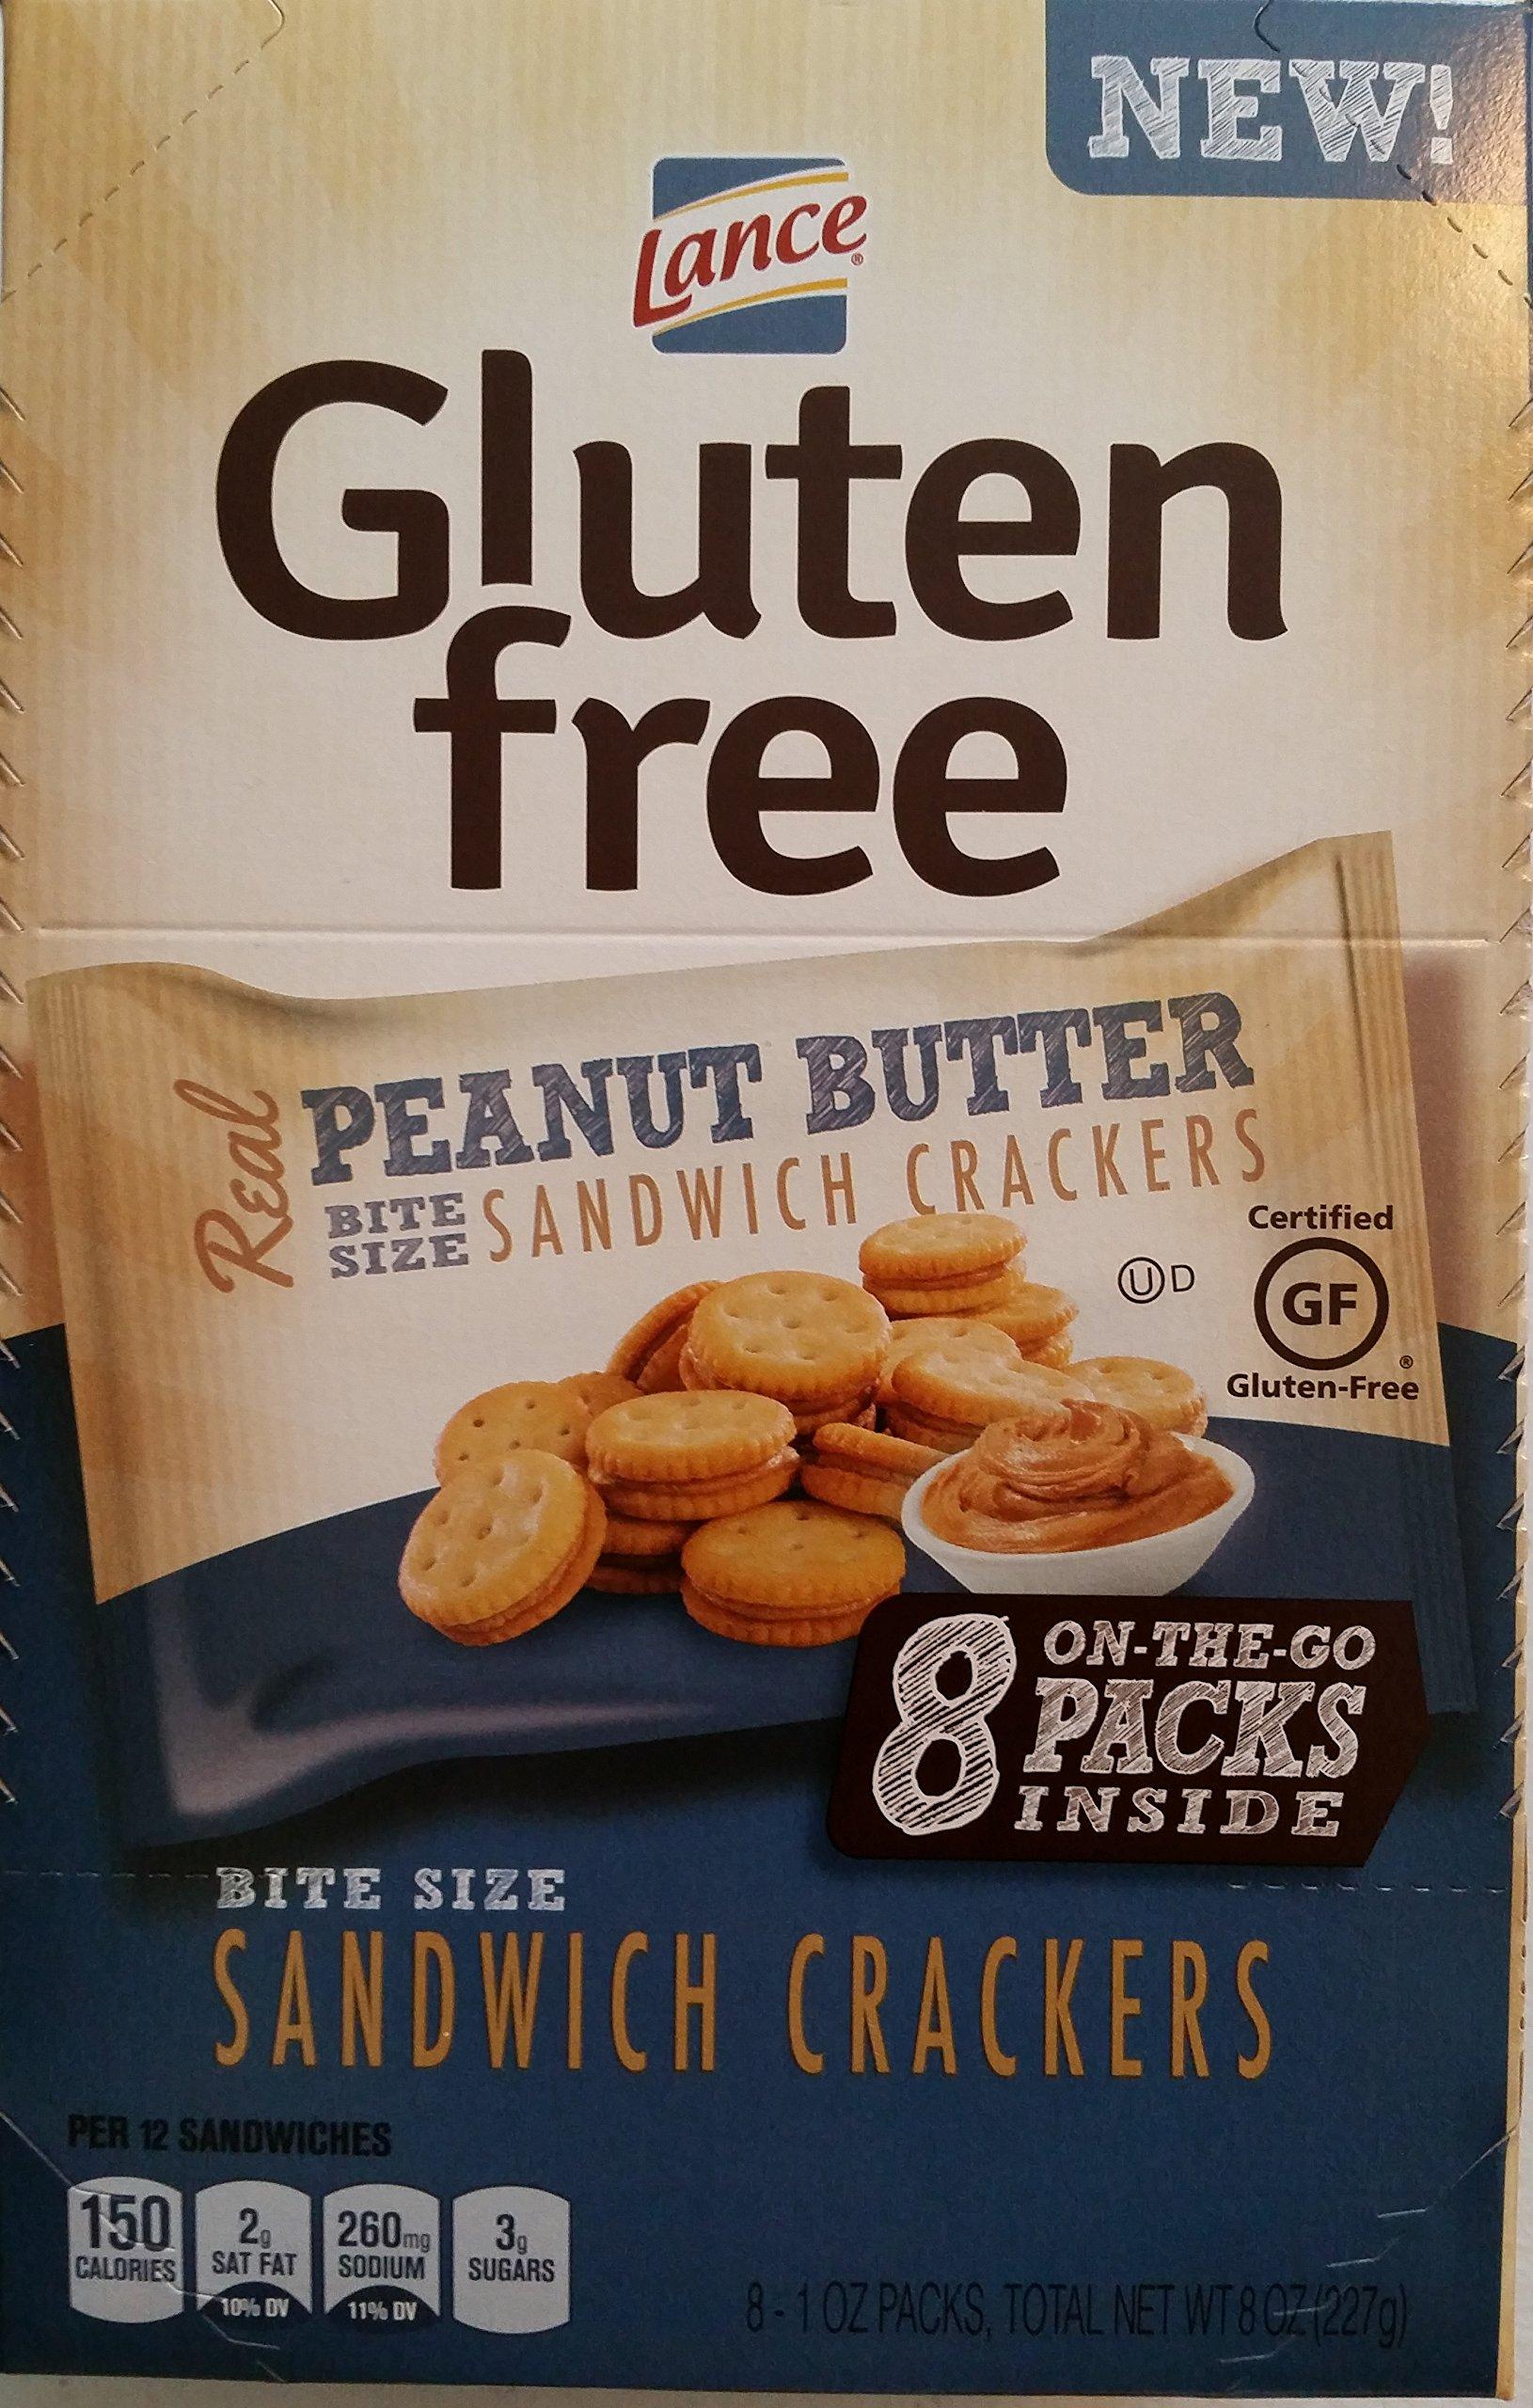 Lance Gluten Free Peanut Butter Sandwich Crackers, 8 Count of 1 Oz. Bags